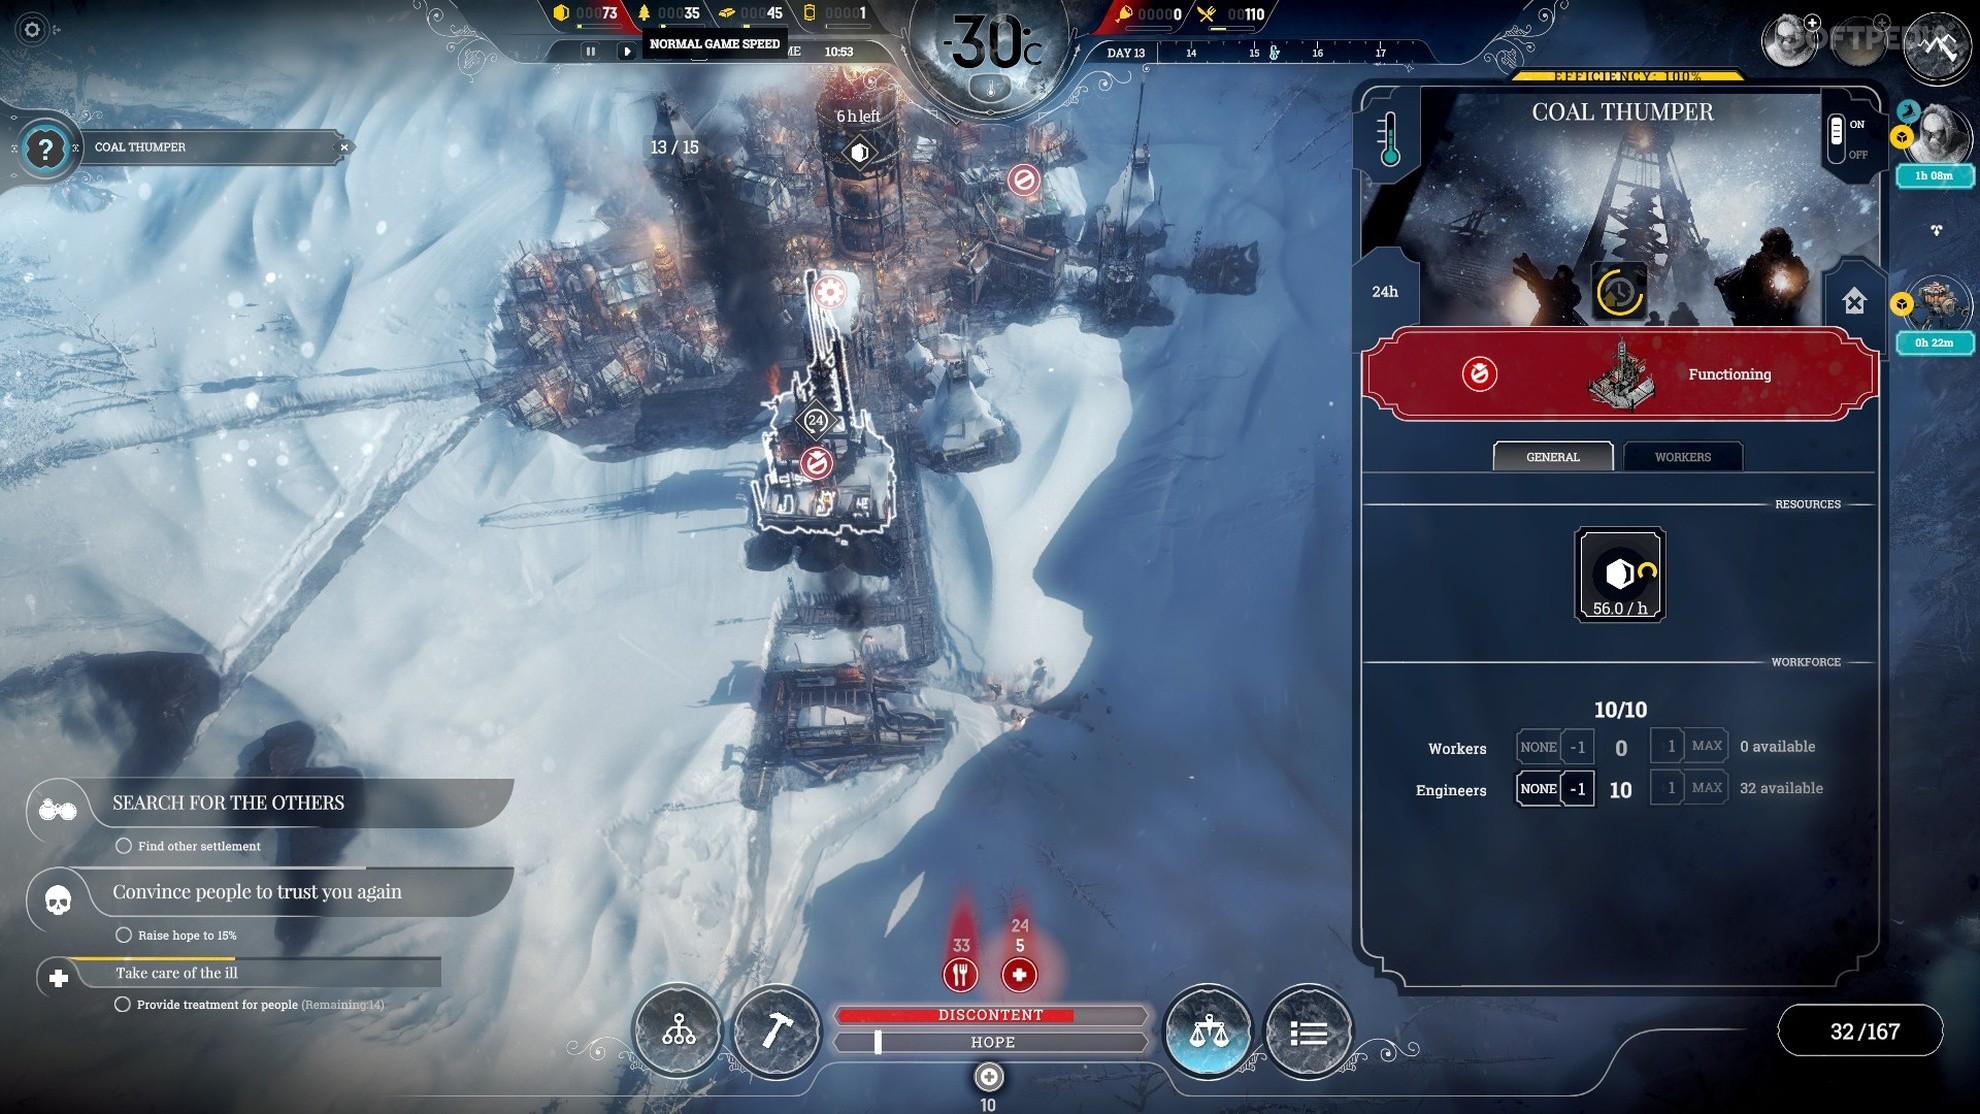 Frostpunk Review - Survive, Adapt, Overcome